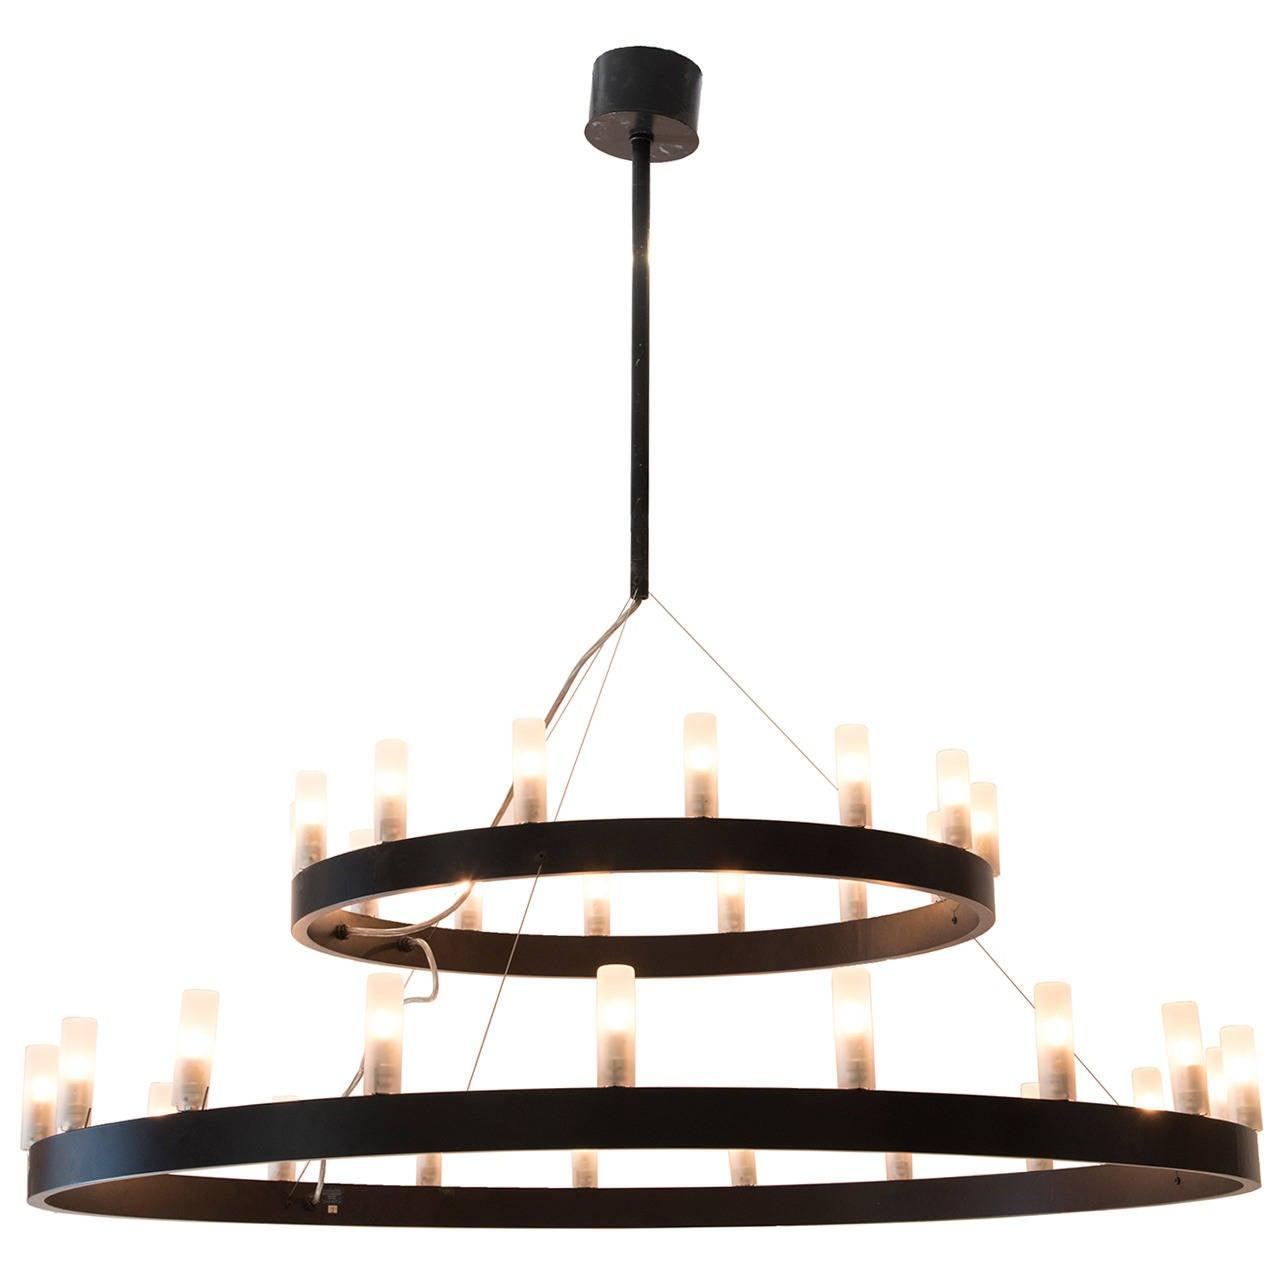 david chipperfield chandelier fontana arte edition italy. Black Bedroom Furniture Sets. Home Design Ideas